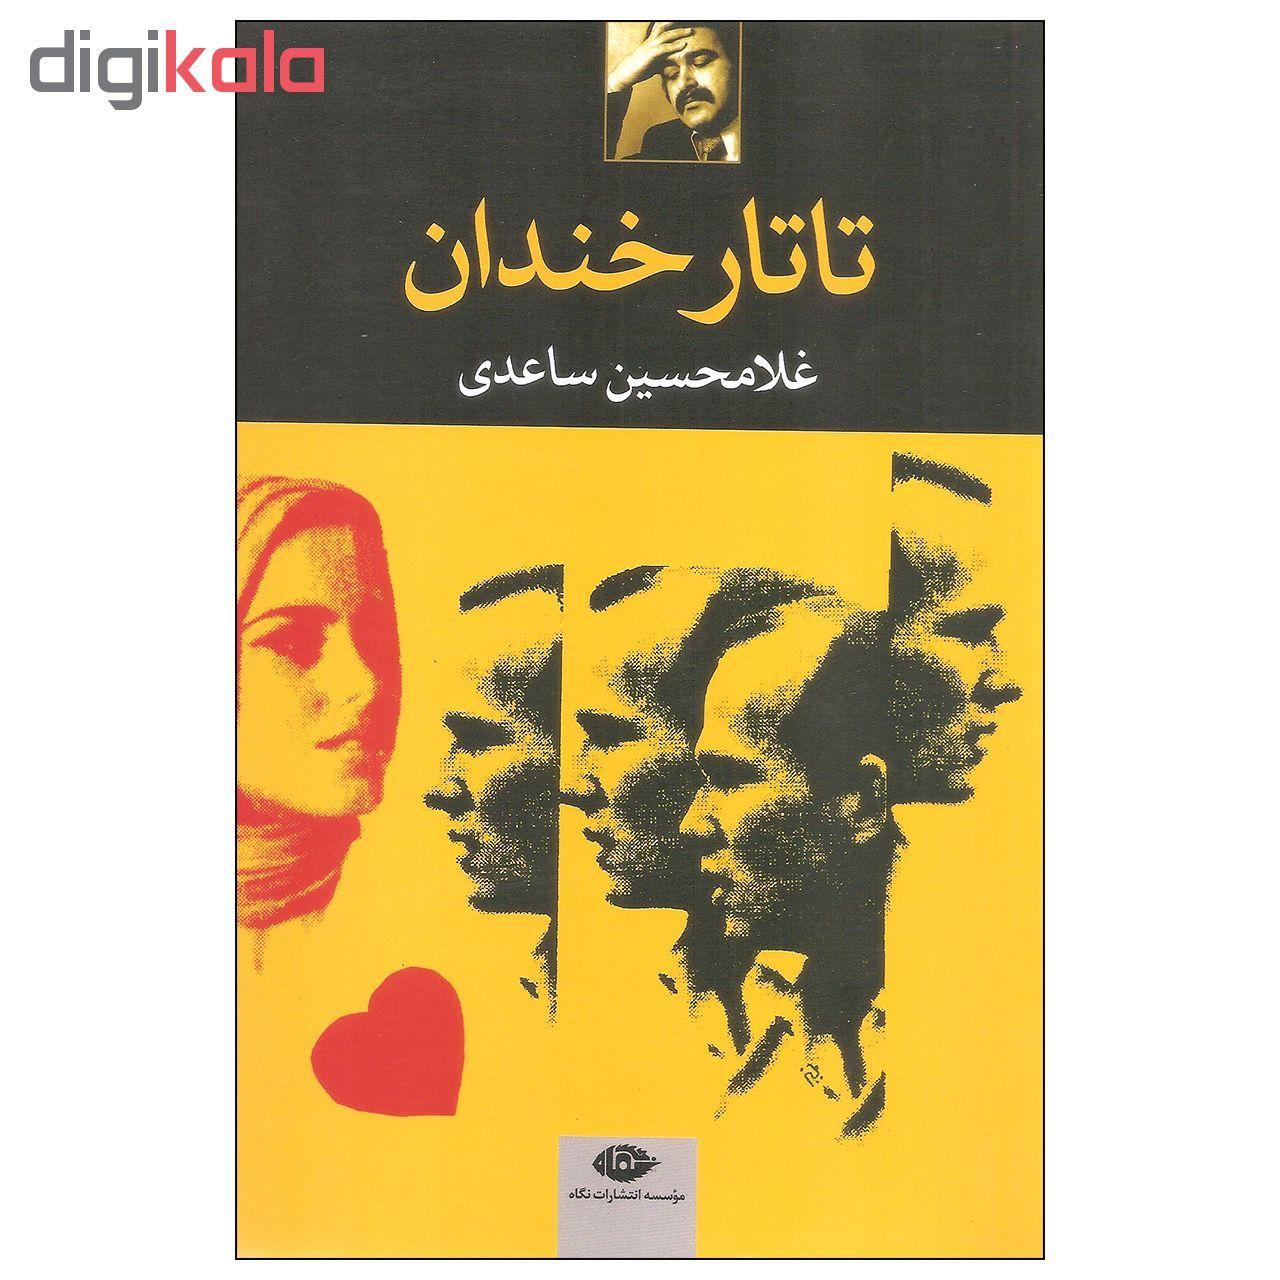 کتاب تاتار خندان اثر غلامحسین ساعدی نشر نگاه main 1 1